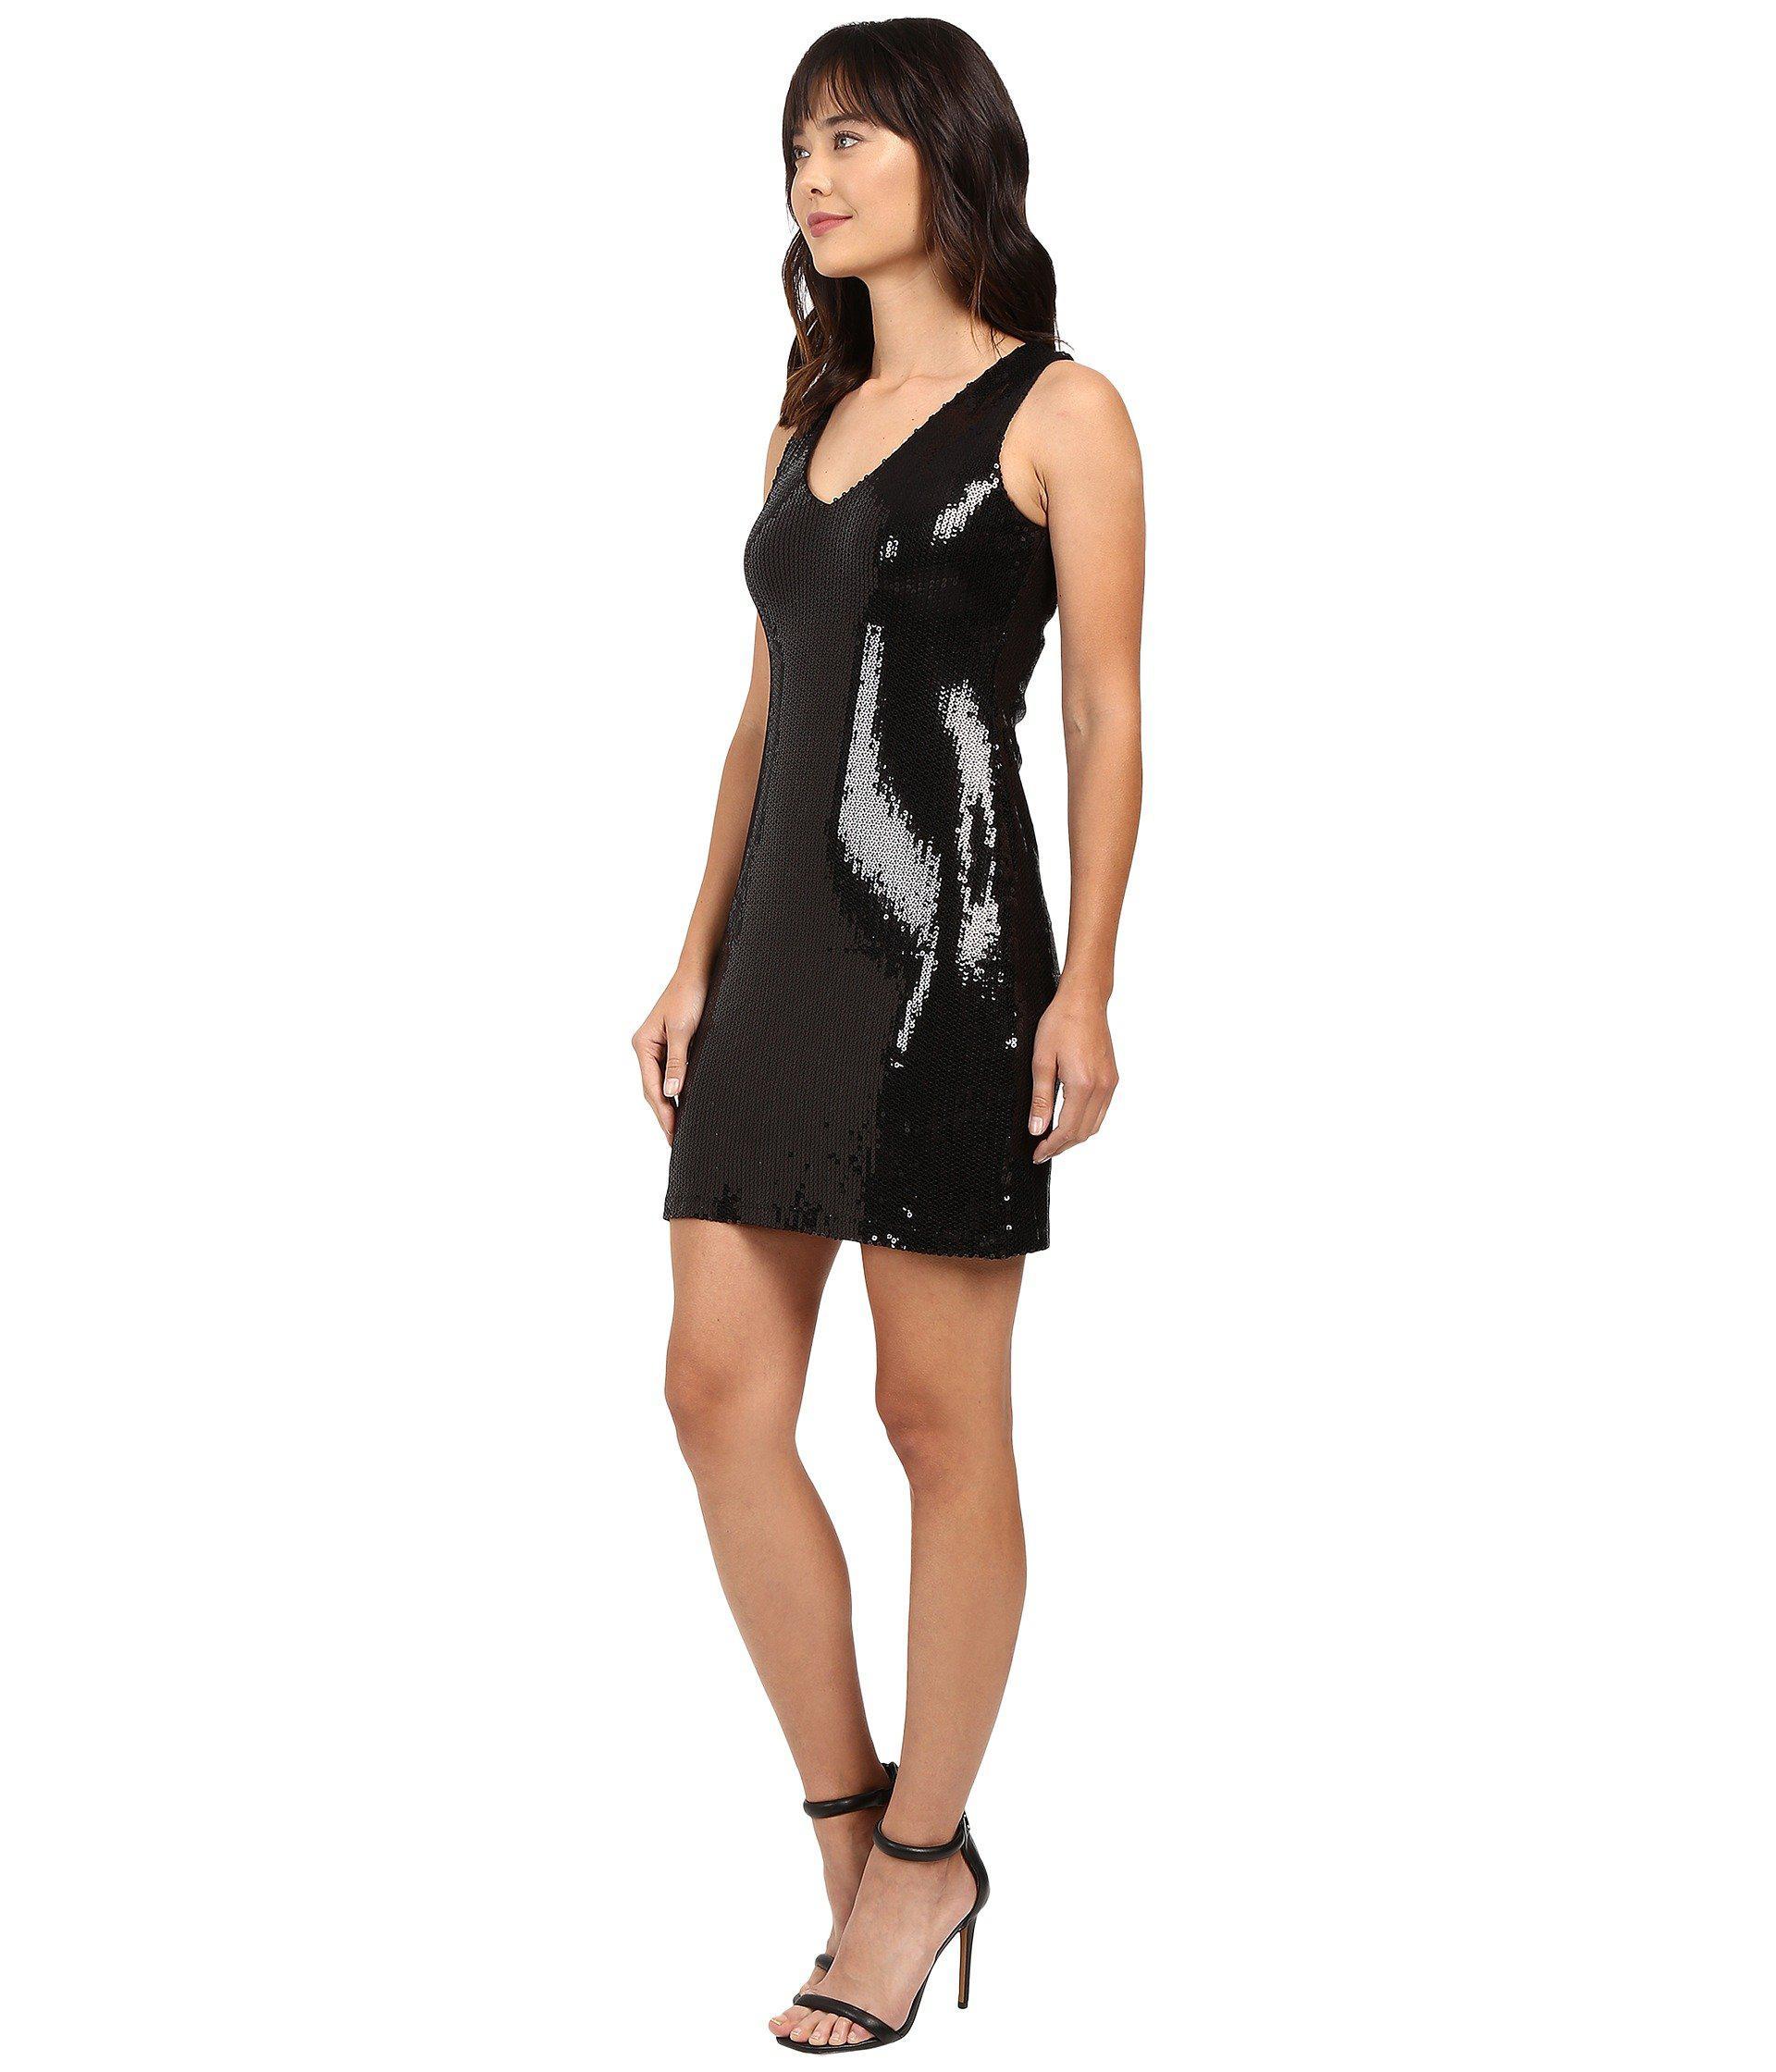 65beeb80dd0 Lyst - Karen Kane V-neck Sequin Sheath Dress in Black - Save 13%